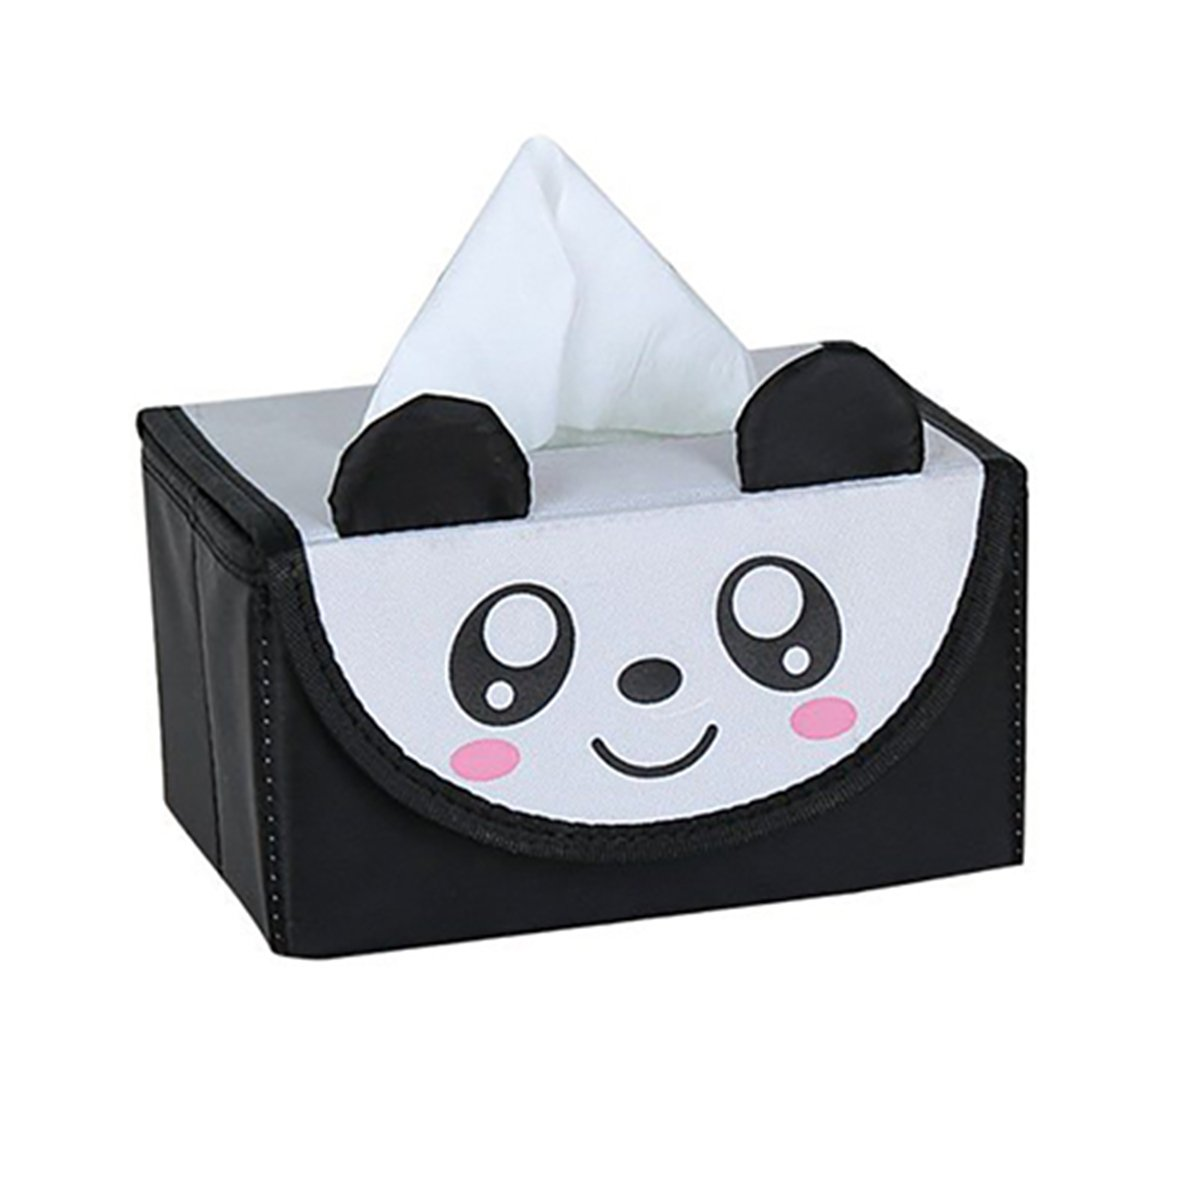 Funi Non-woven Cute Animal Tissue Box Cloth Napkin Holder Seat Type Tissue Case for Home Decoration (Black Panda)